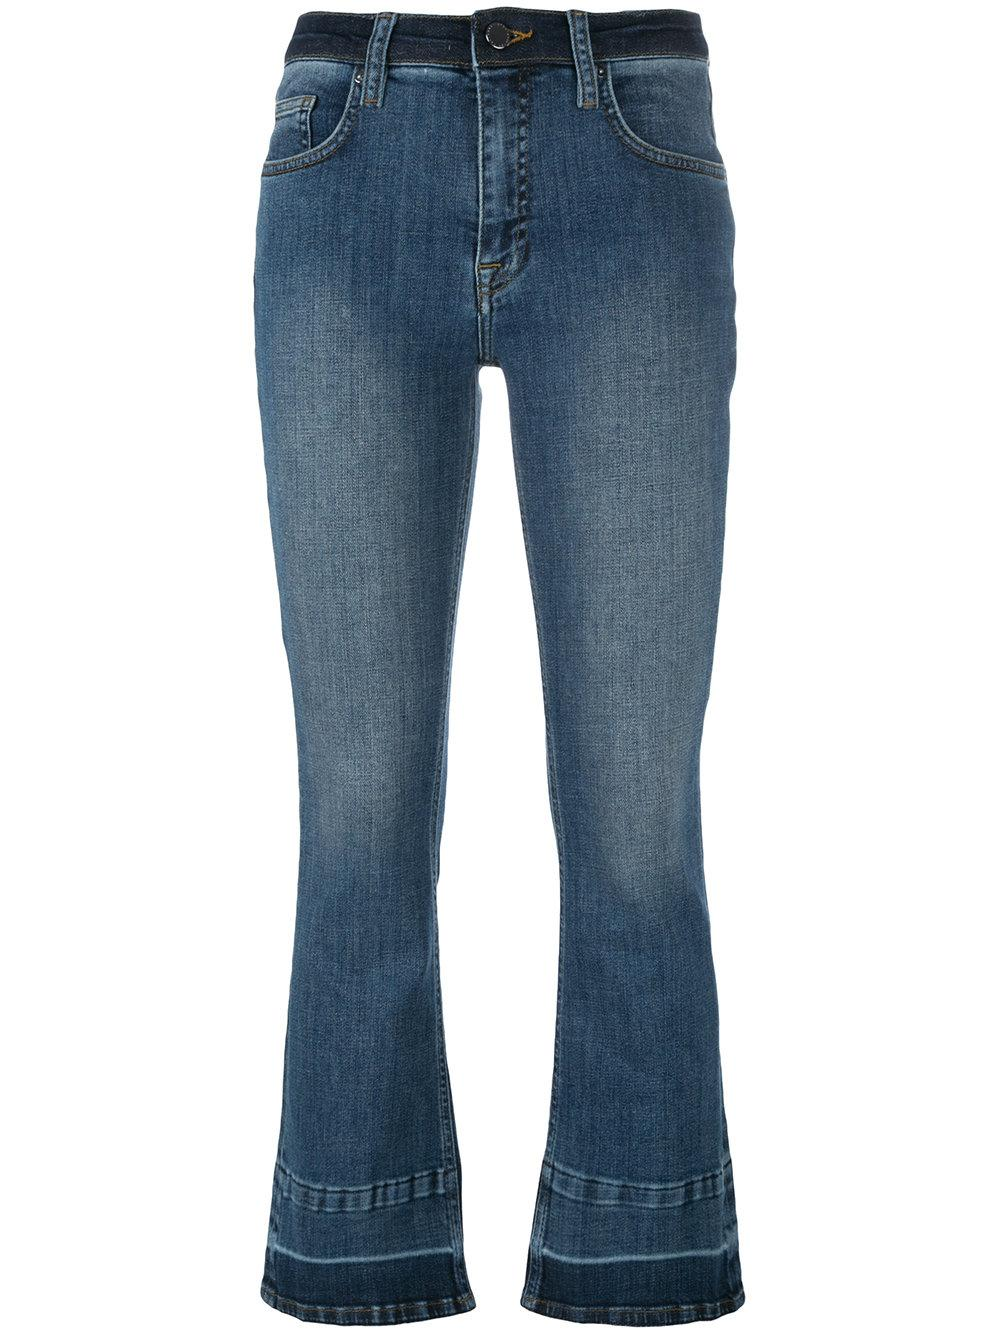 victoria victoria beckham cropped flare jeans in blue lyst. Black Bedroom Furniture Sets. Home Design Ideas